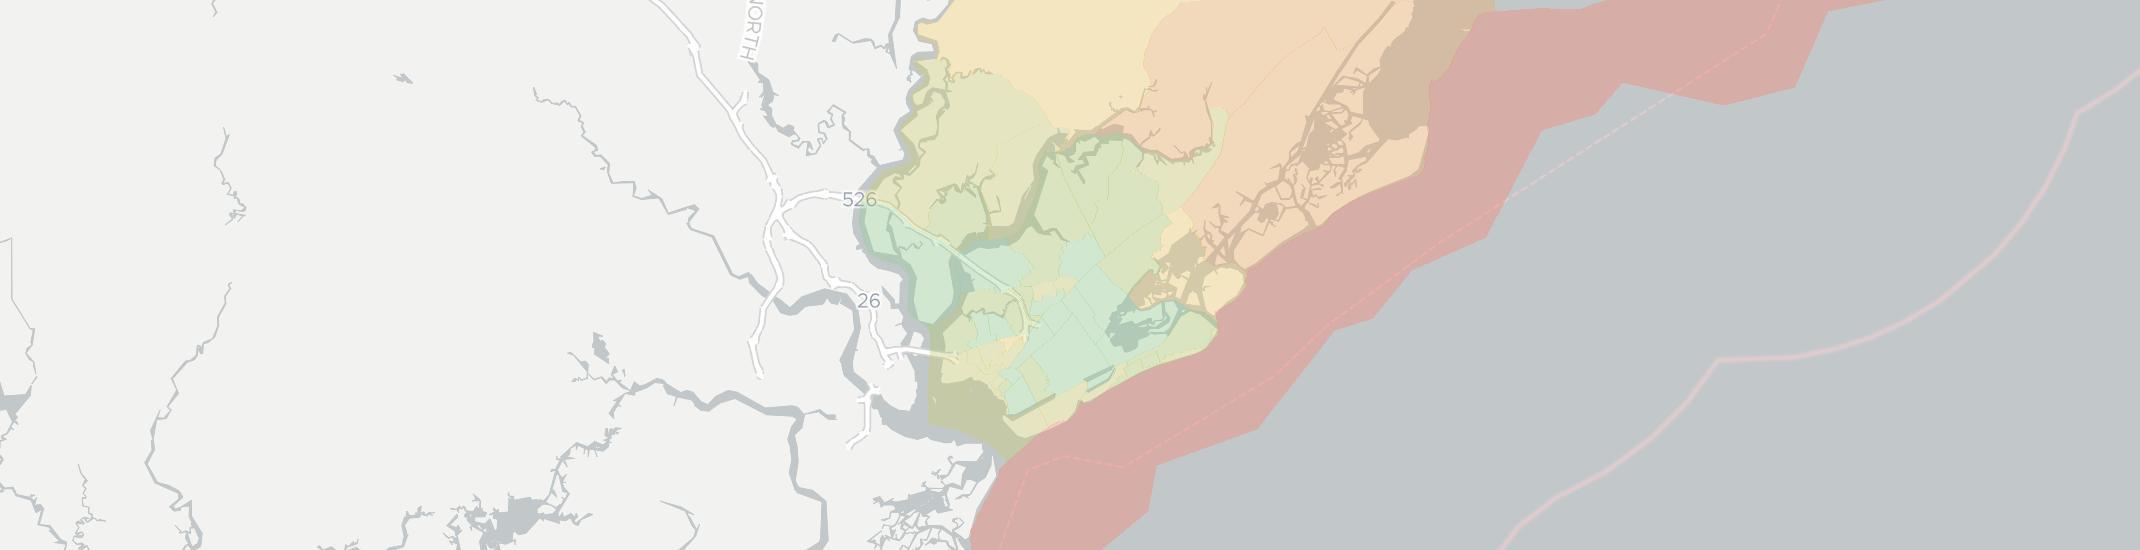 Mount Pleasant Sc Zip Code Map.Internet Providers In Mount Pleasant Sc Compare 15 Providers